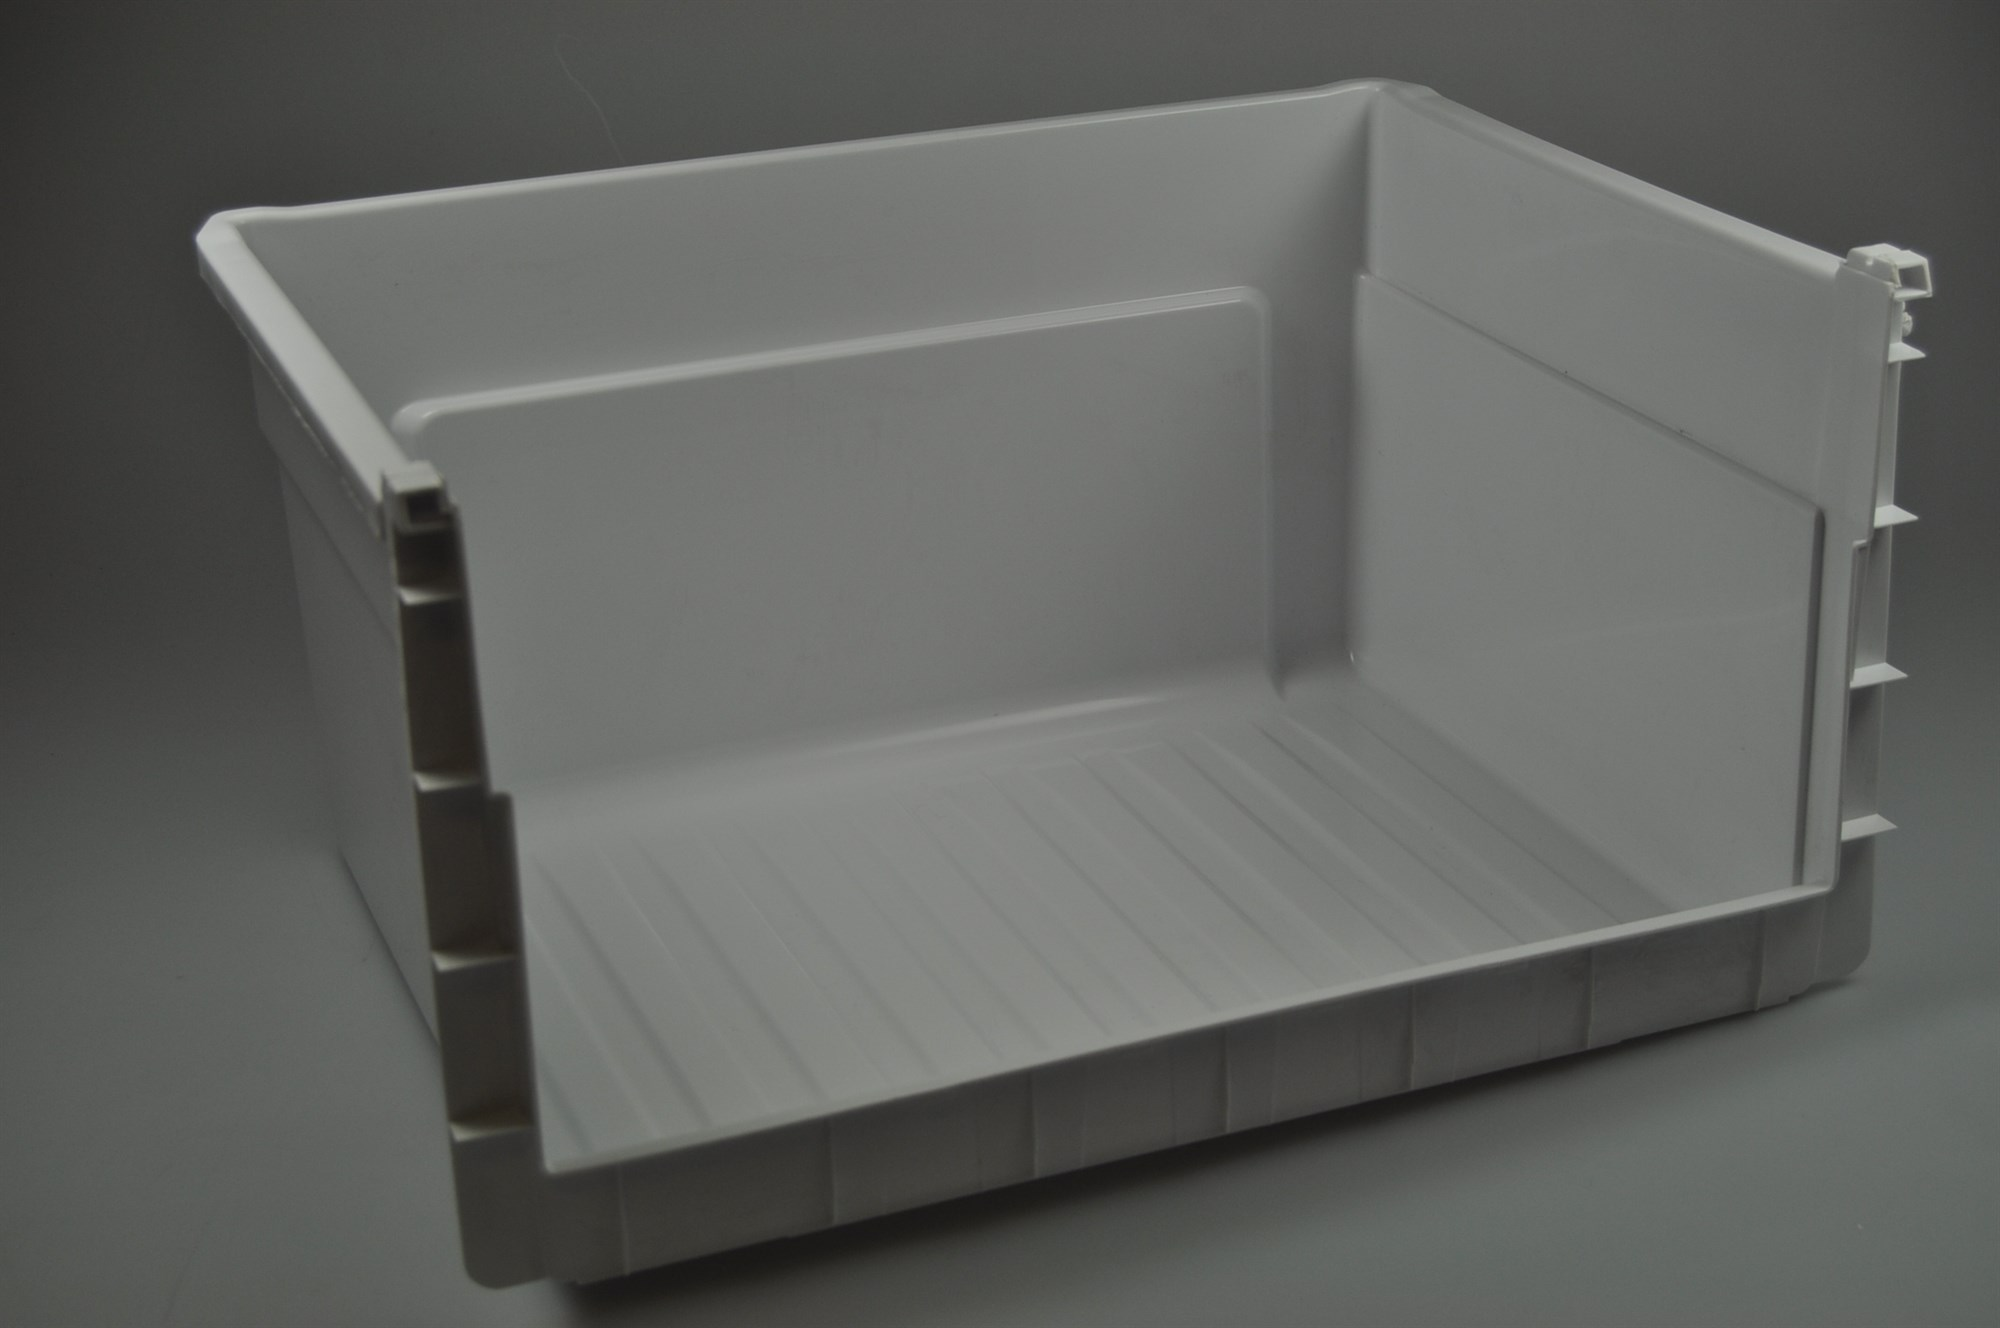 Side By Side Kühlschrank Schublade : Gemüseschublade samsung side by side kühlschrank untere